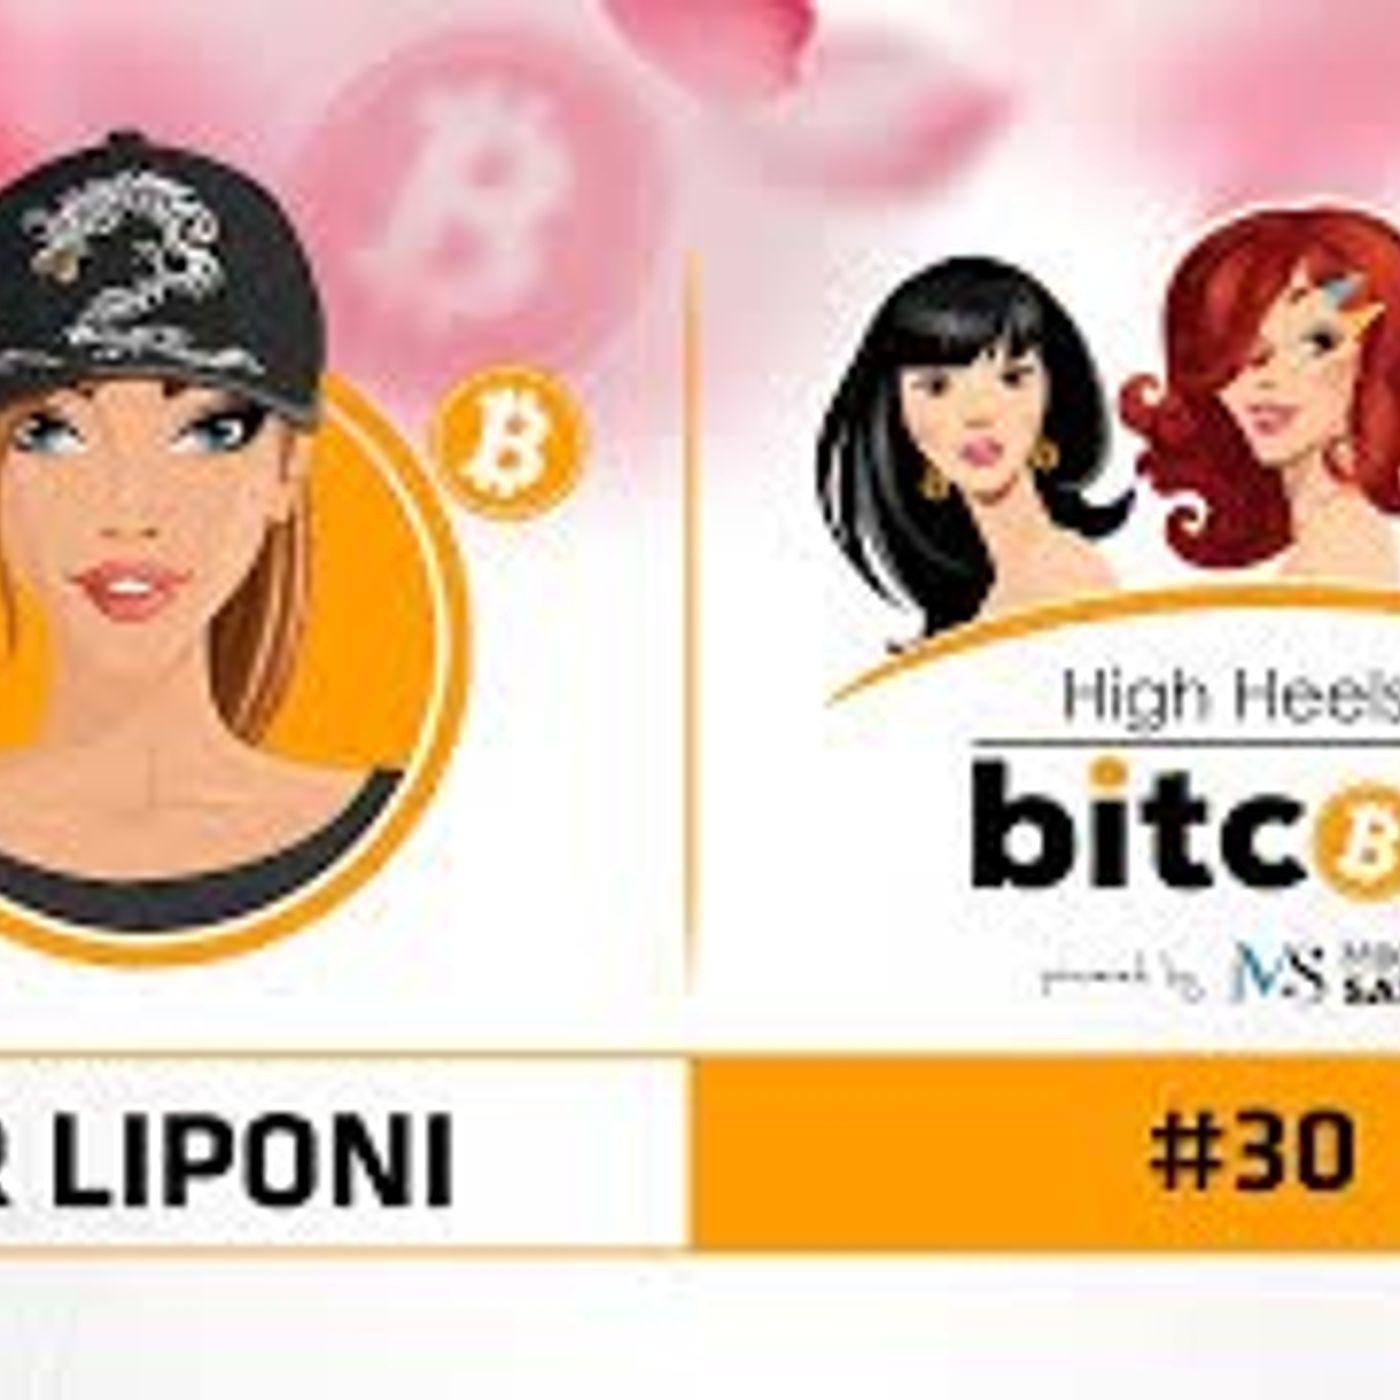 High Heels of Bitcoin #30 | Mir Liponi (@mir_btc)